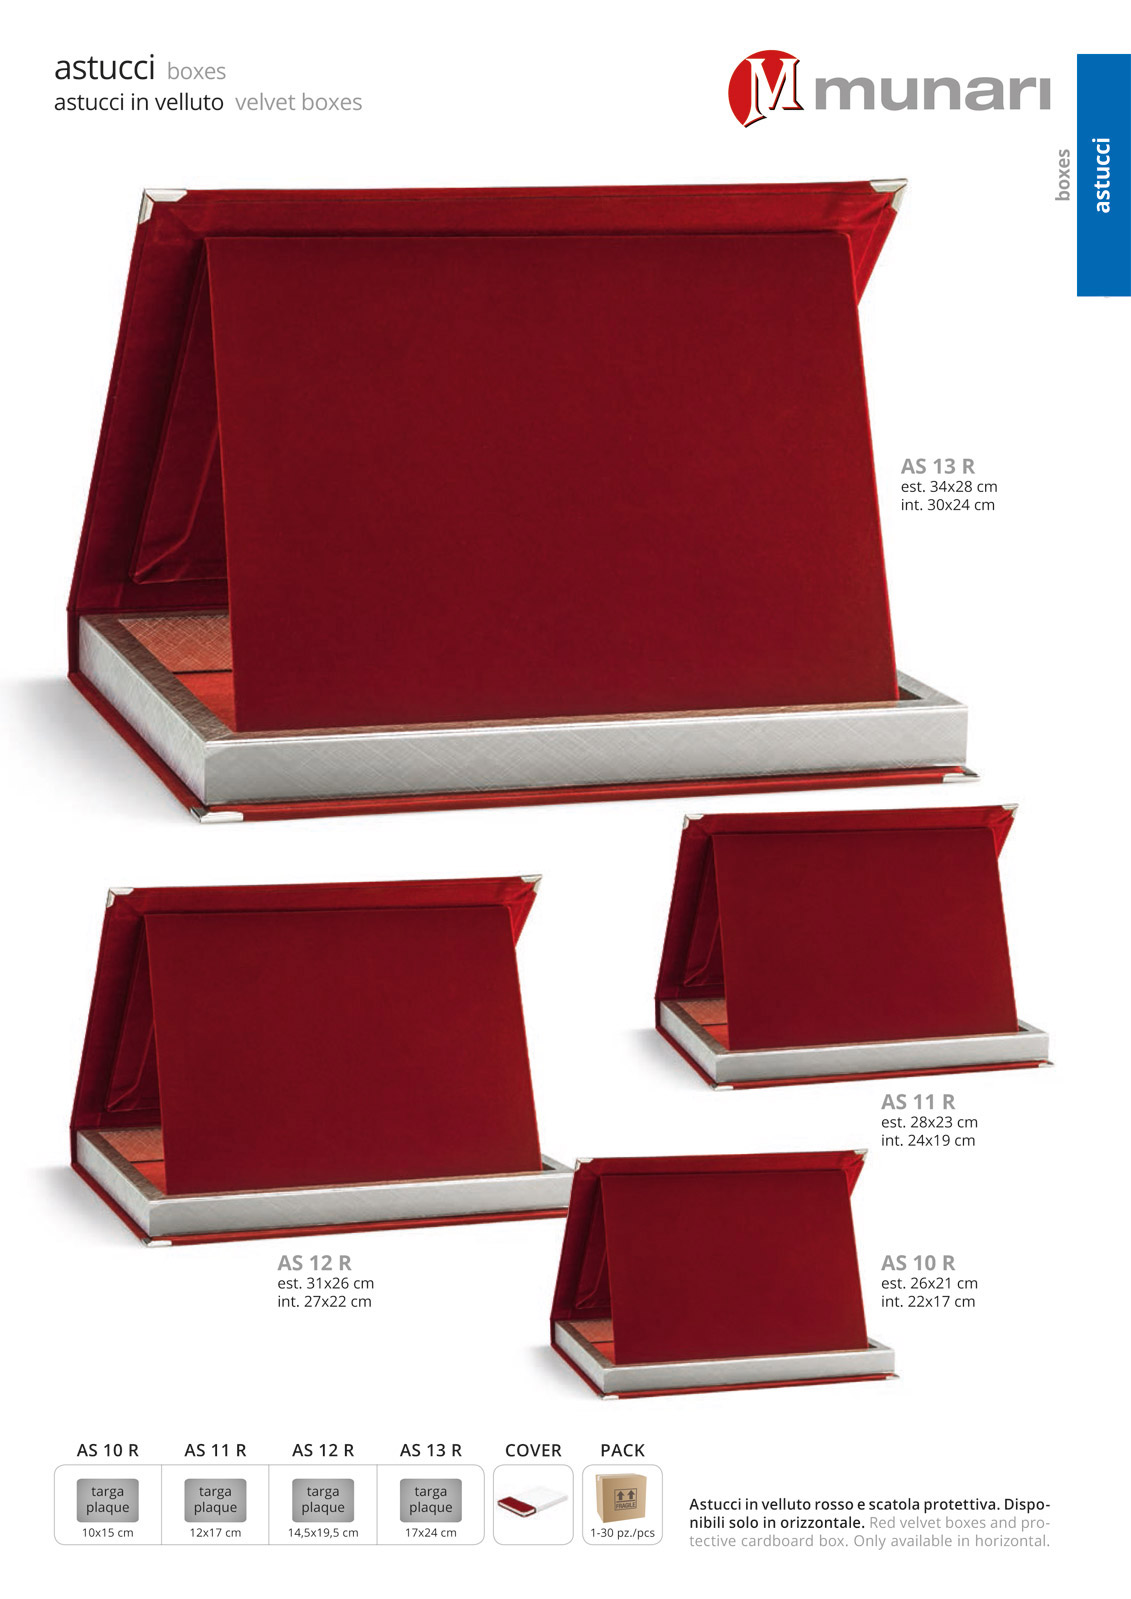 Astucci in velluto rosso per targhe serie AS 10R